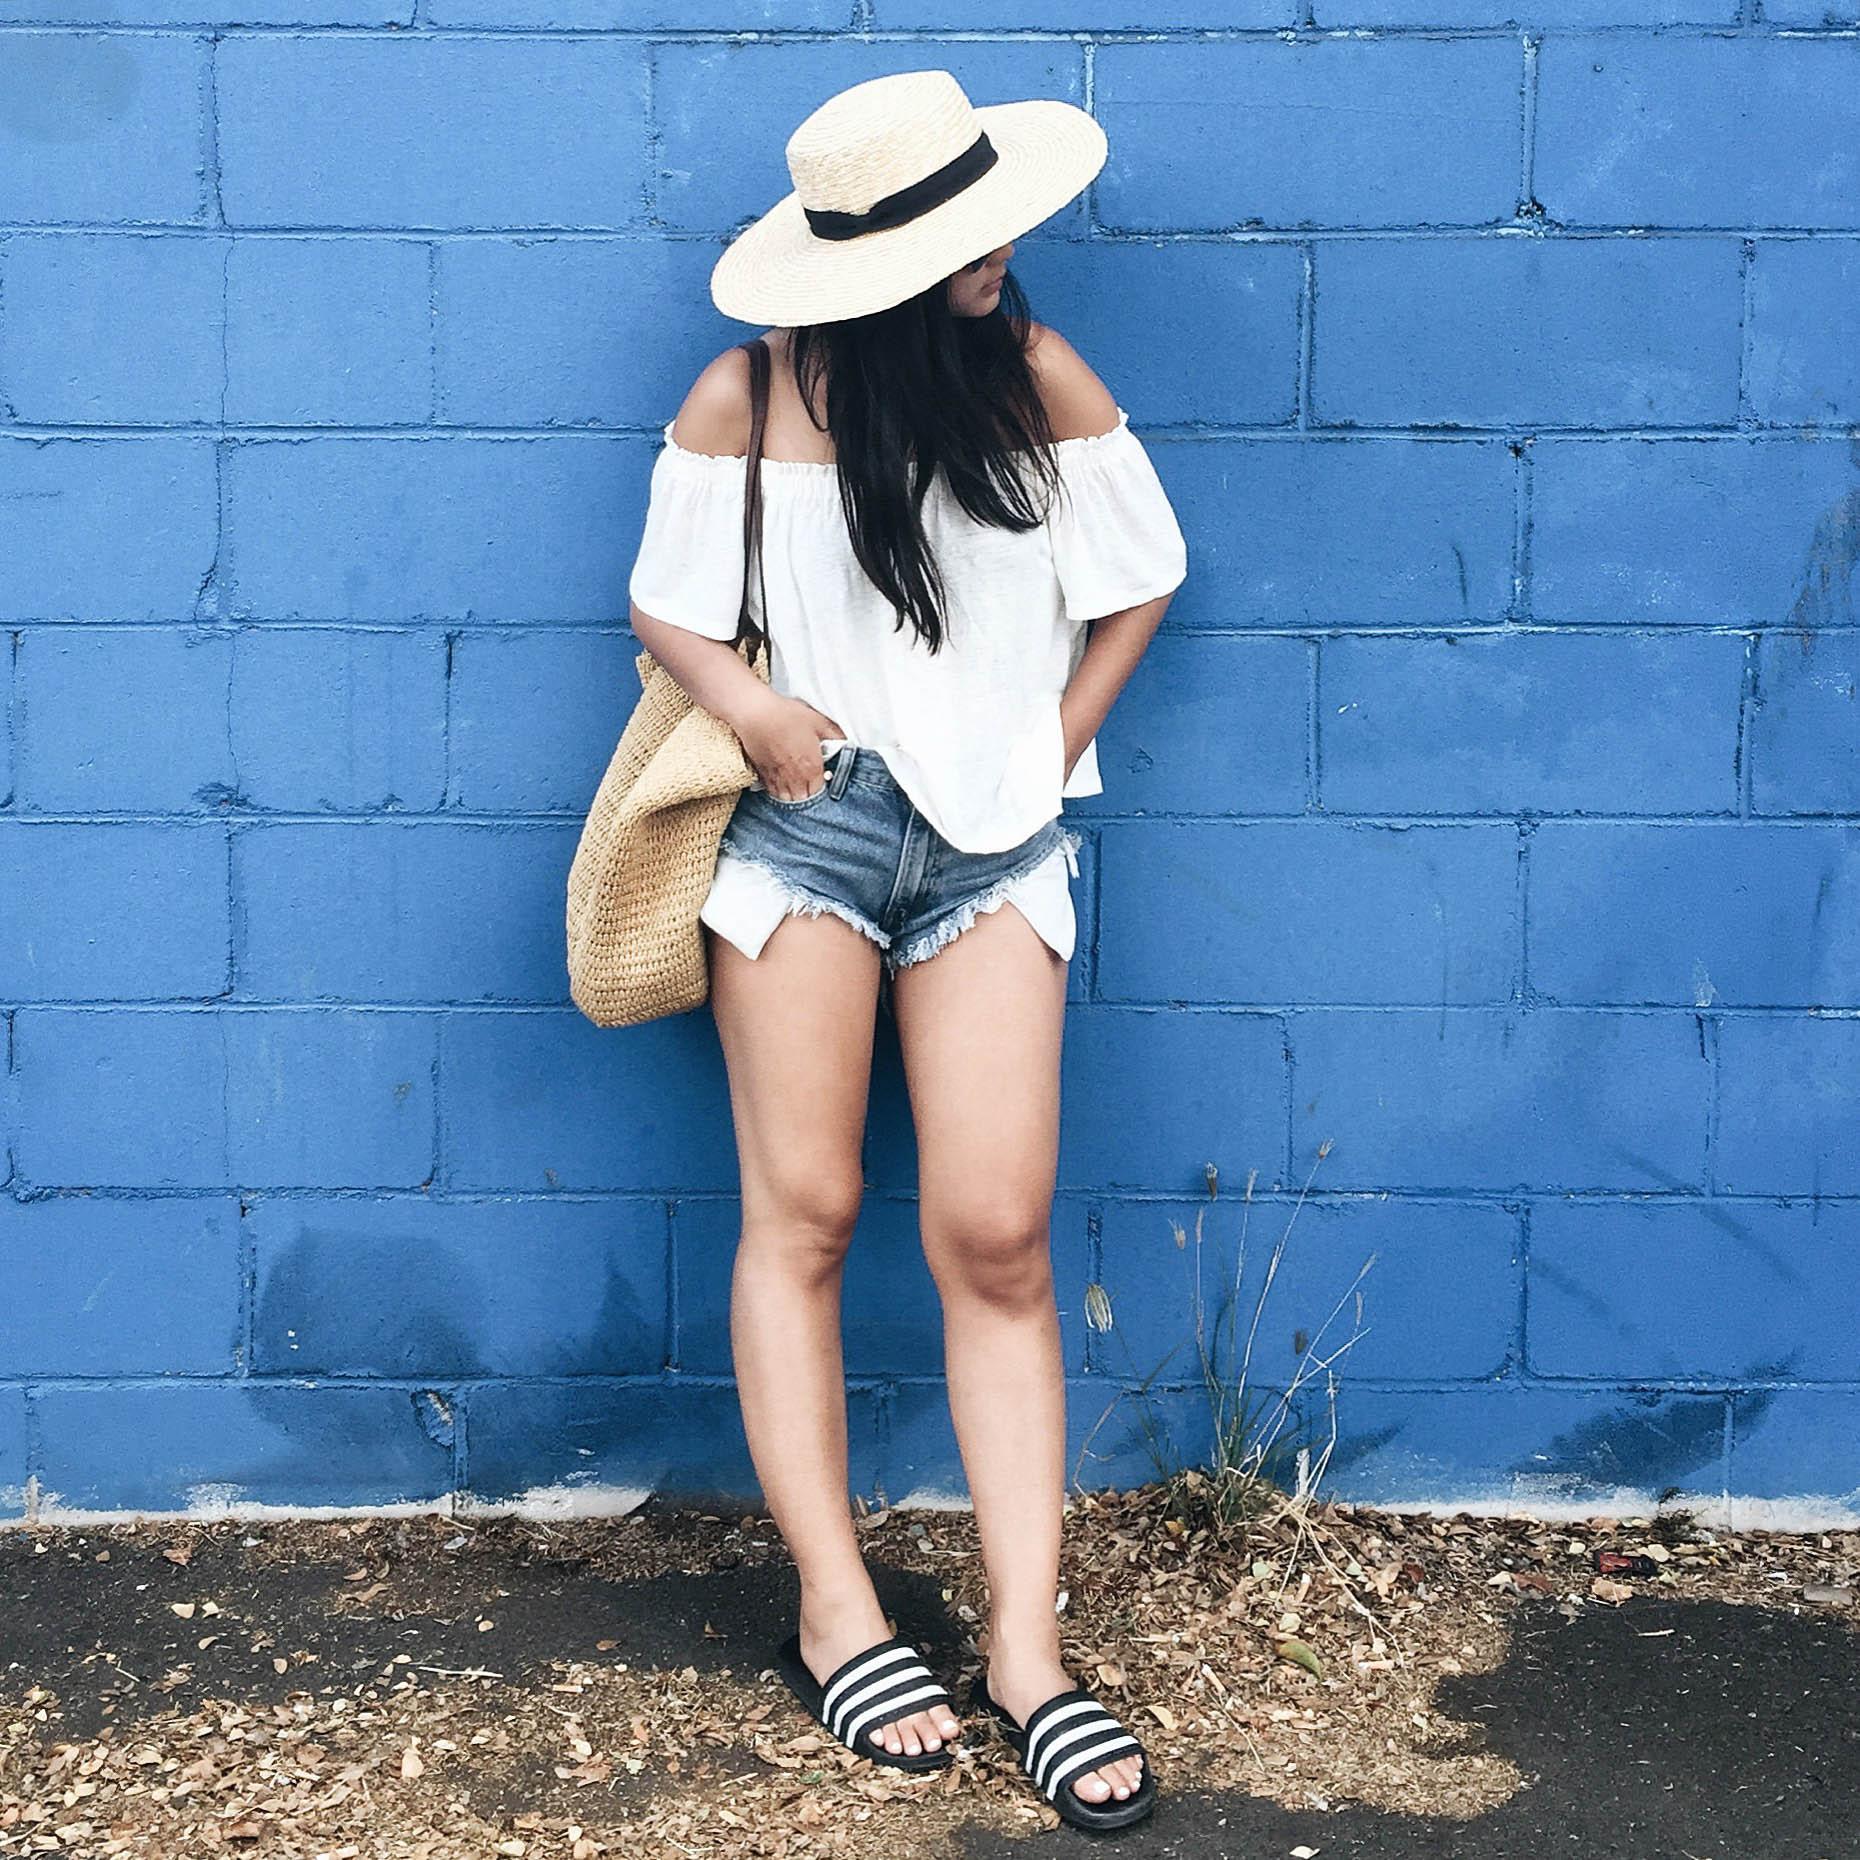 ARITZIA   off-shoulder shirt  / ONE TEASPOON   cut-offs  / ADIDAS   slides  / FREE PEOPLE   hat   / J.CREW   tote